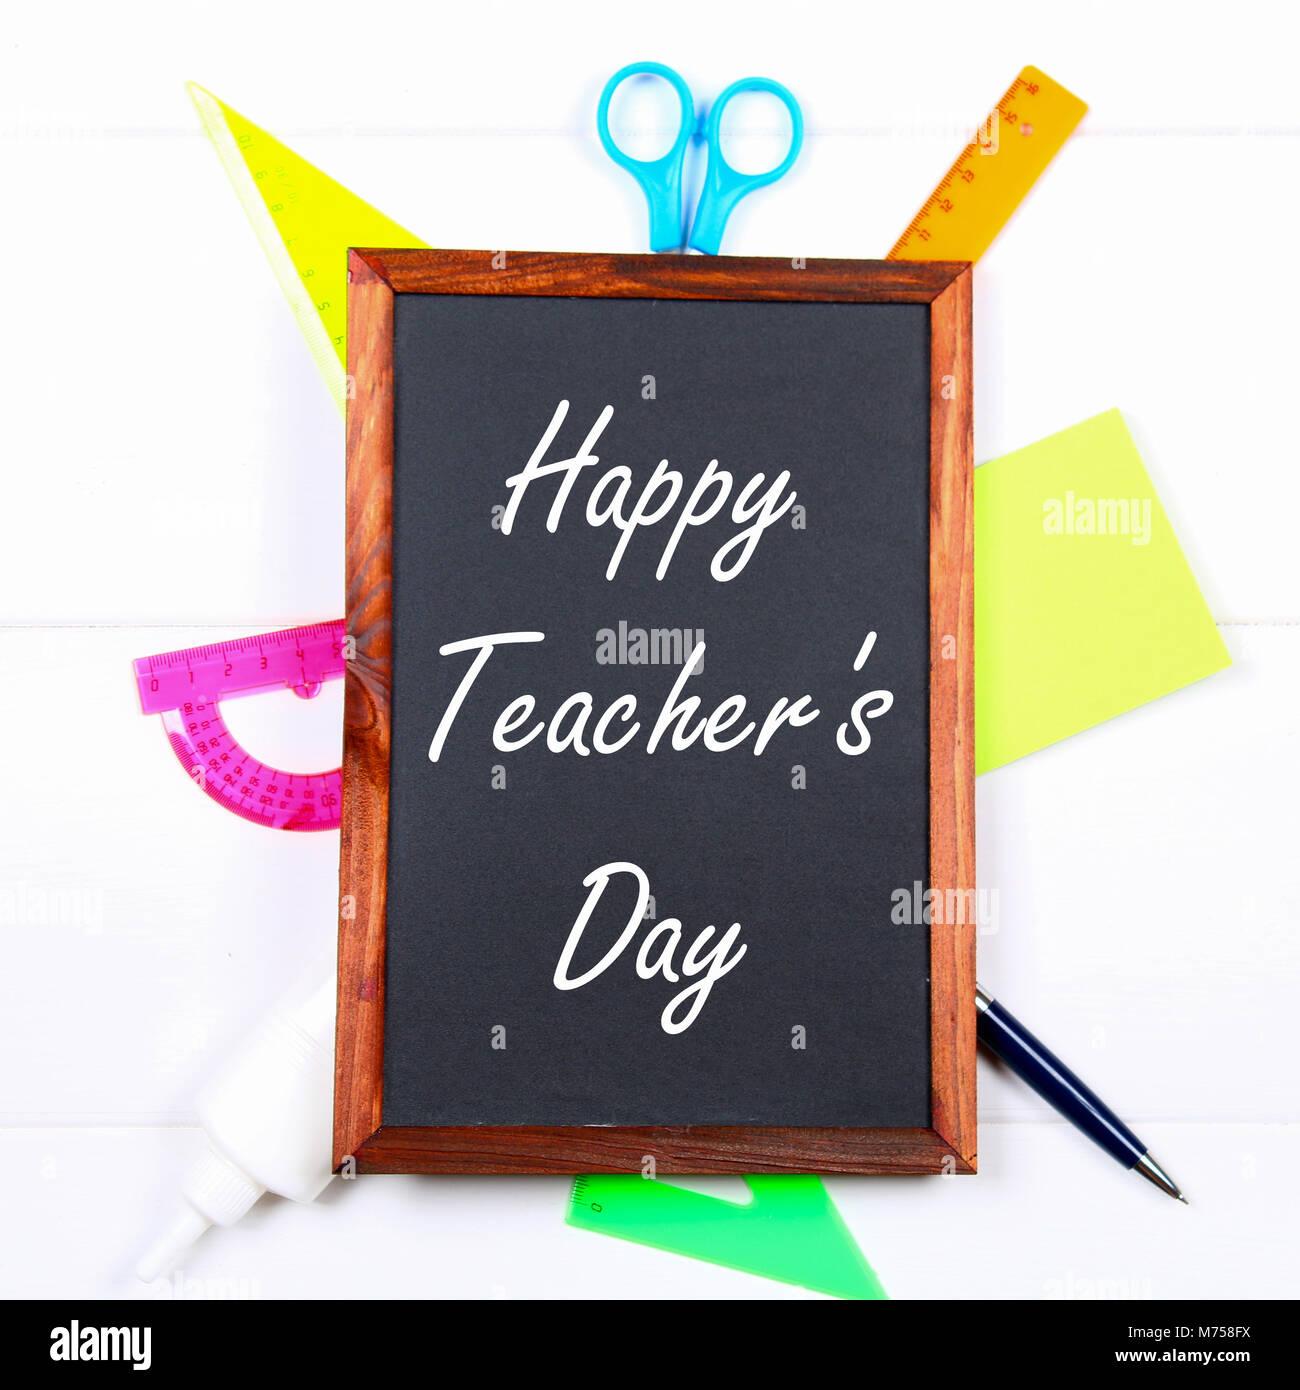 Text Chalk On A Chalkboard: Happy Teacheru0027s Day. School Supplies, Office,  Books, Apple